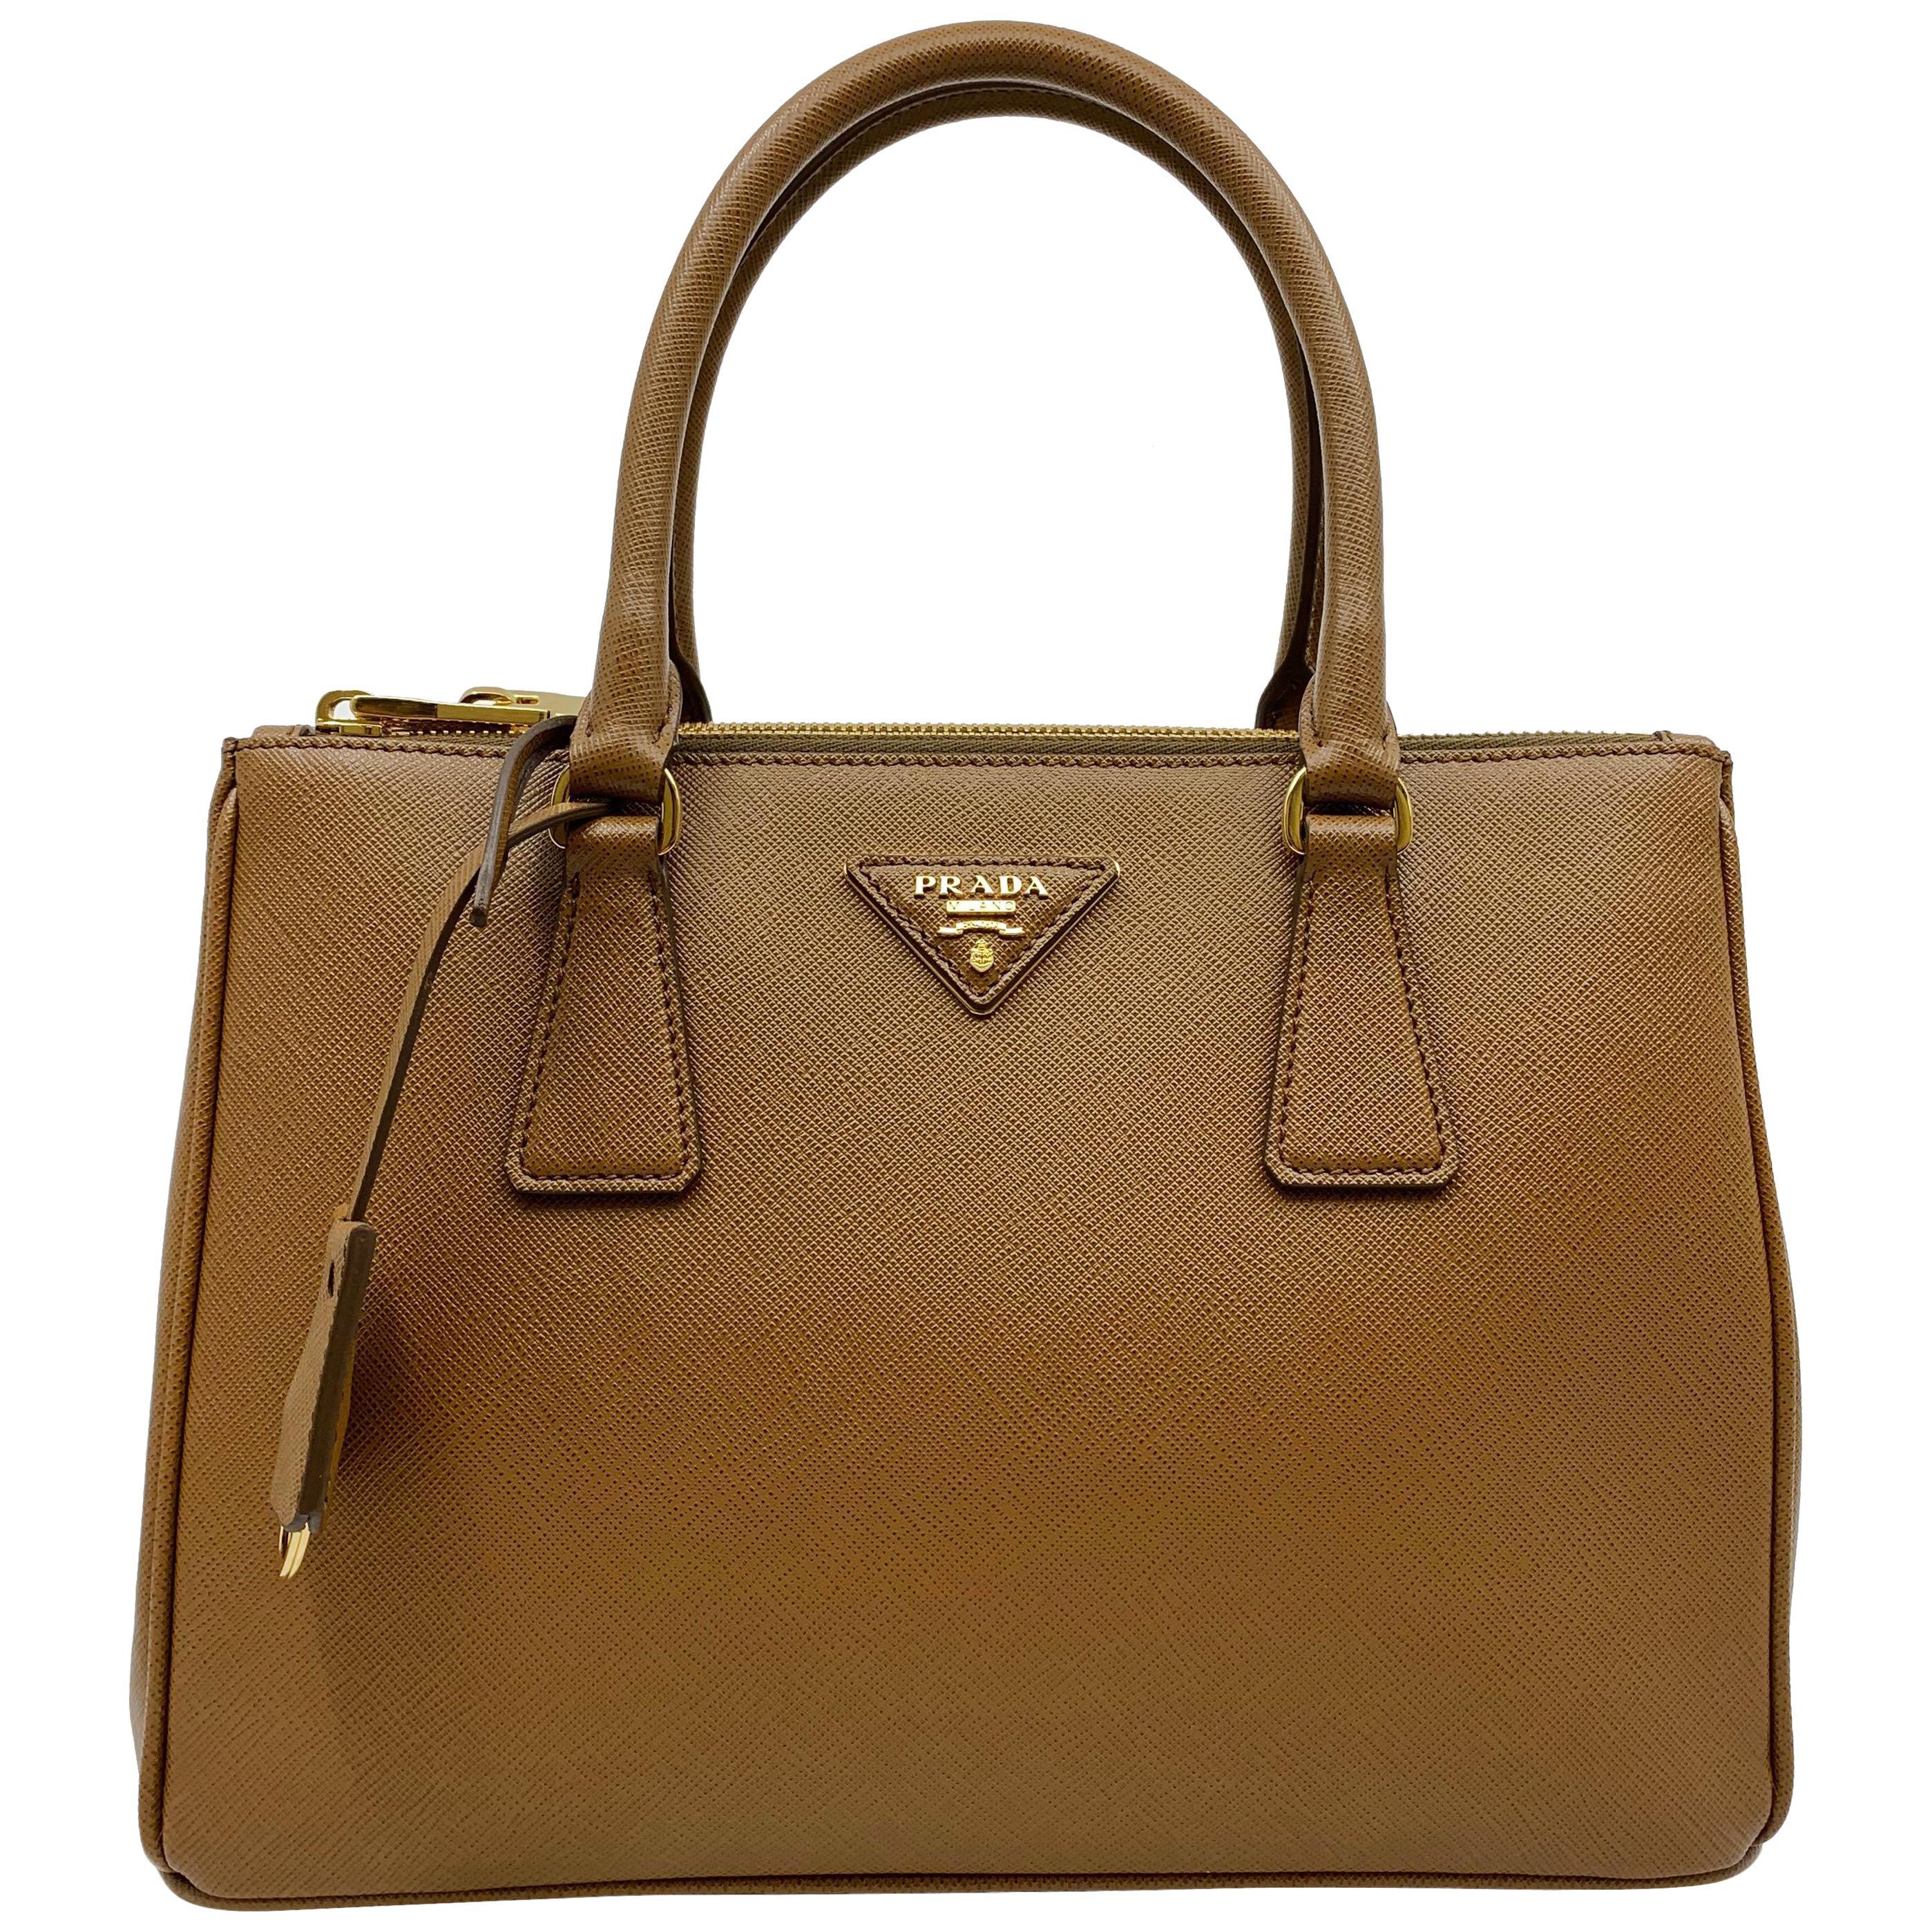 870ede66c39b1e Prada Orange Nylon Crossbody Bag at 1stdibs